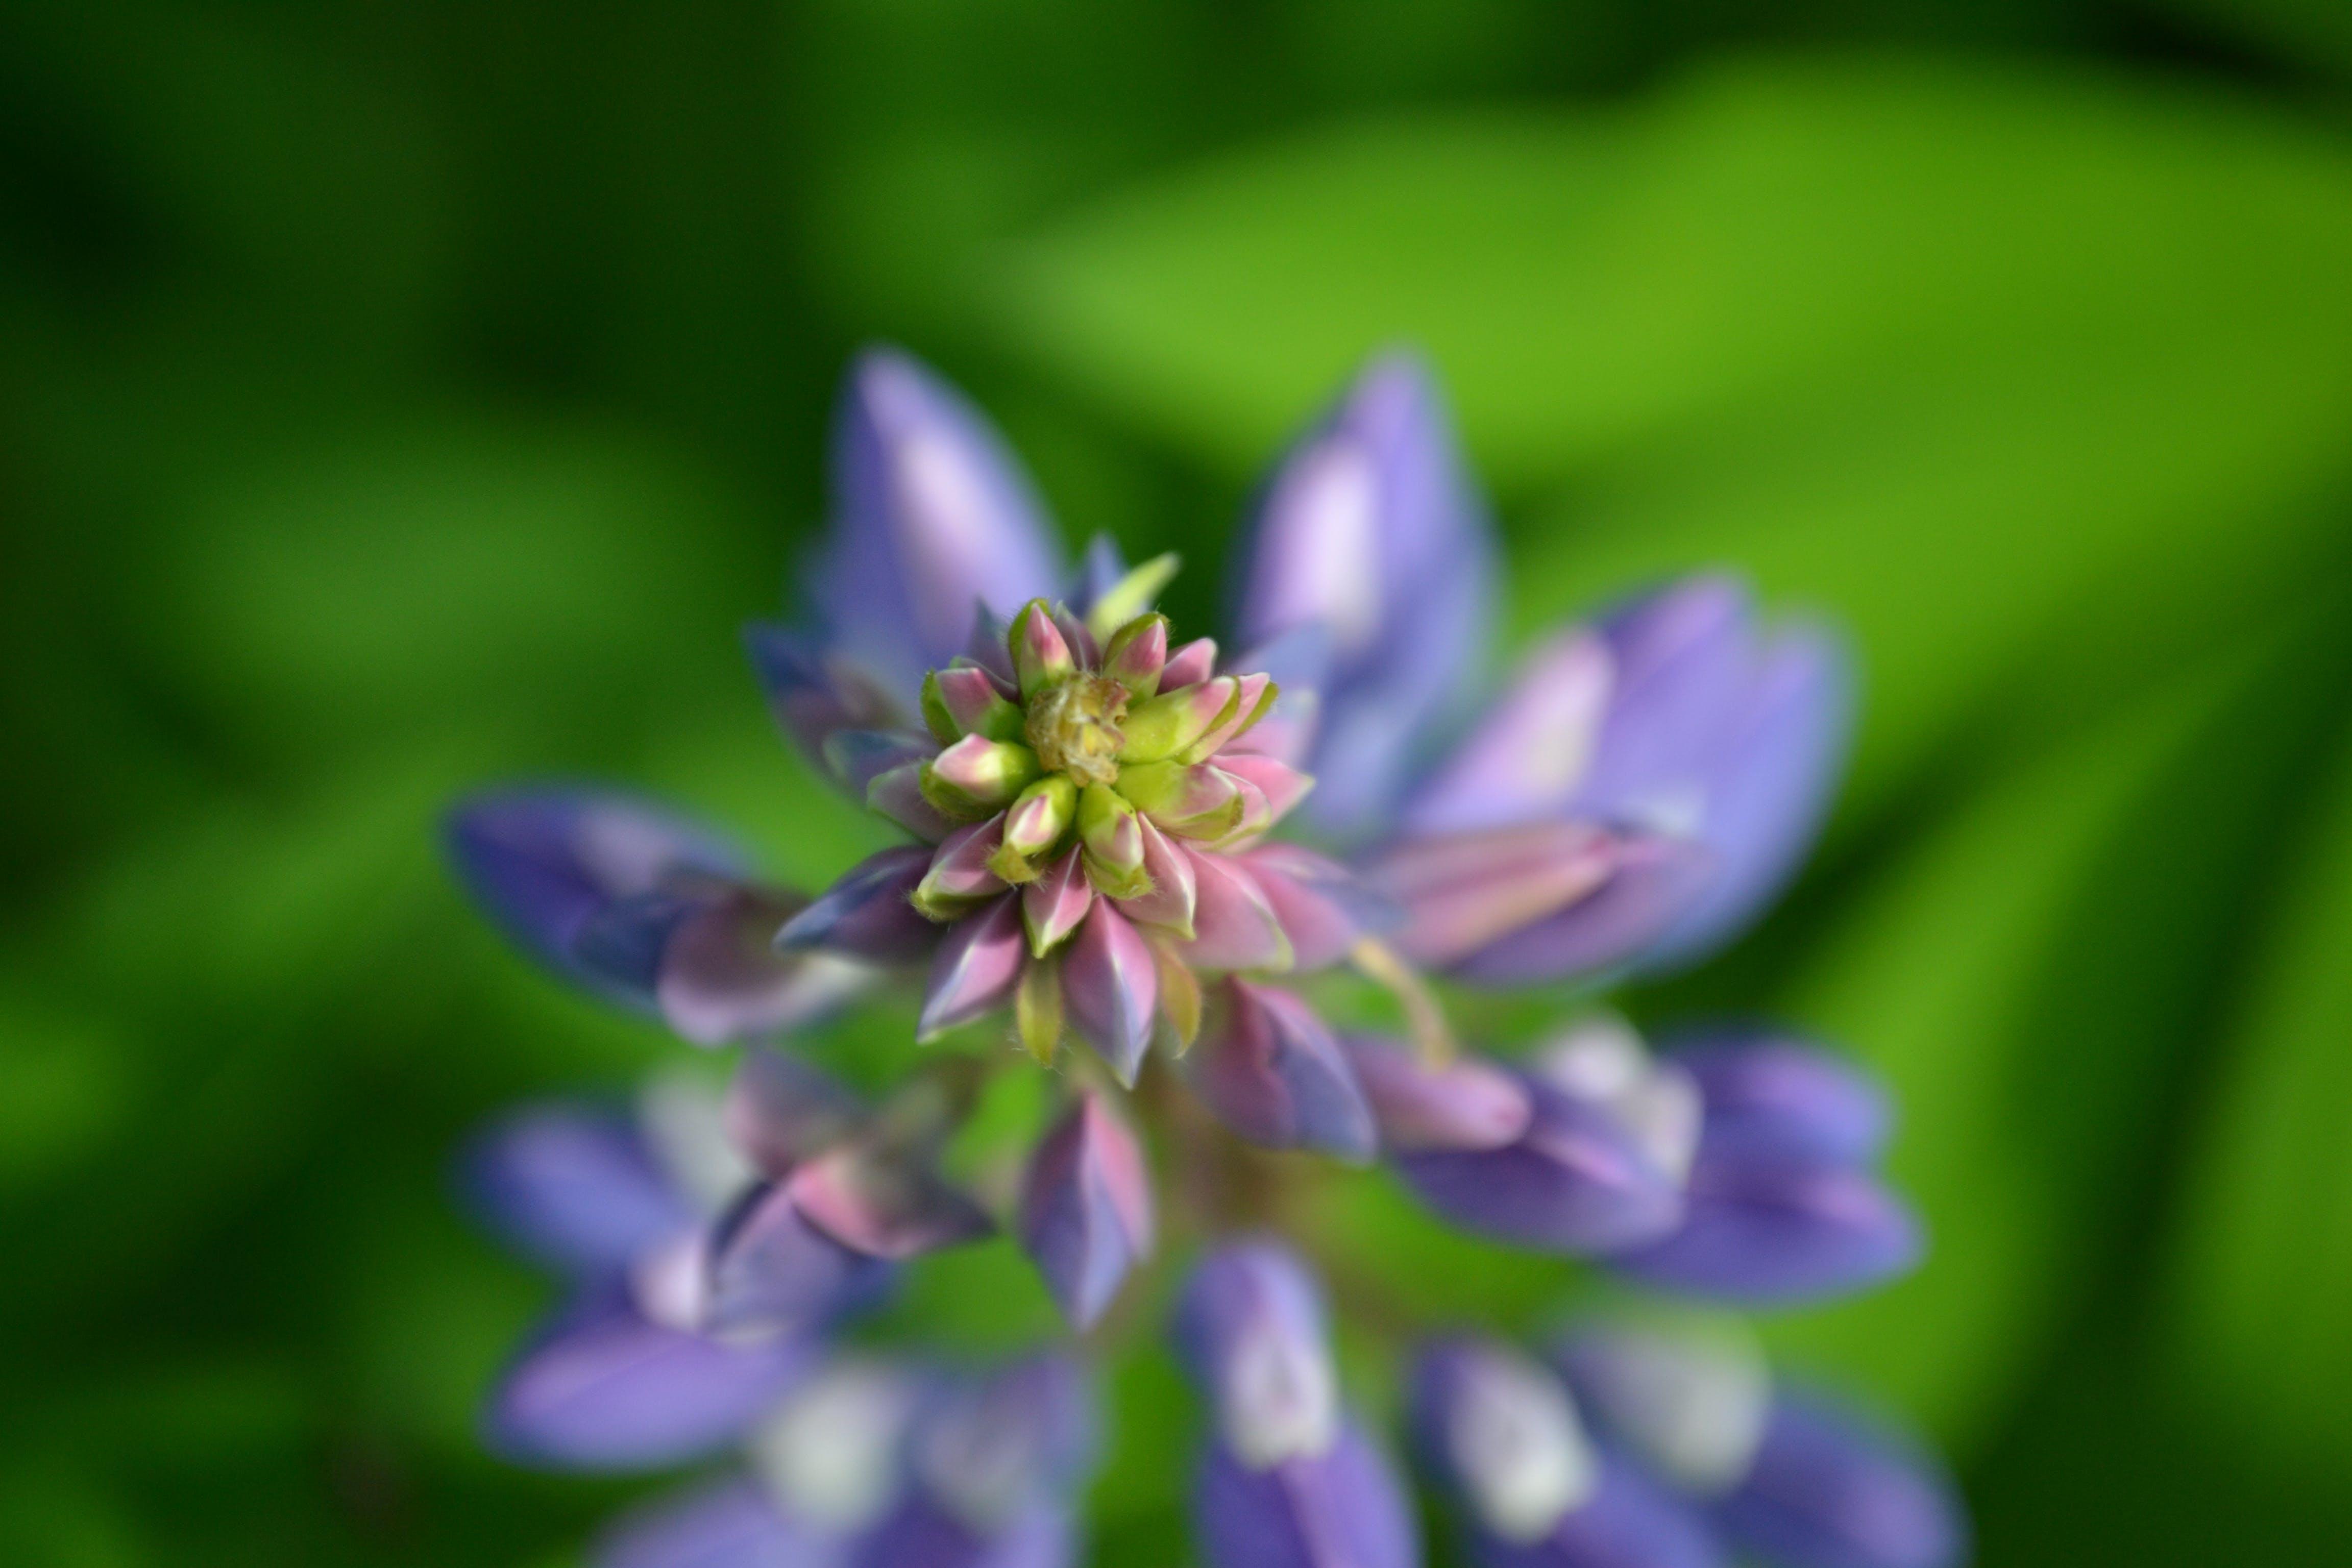 Focus Photography of Purple Petaled Flower